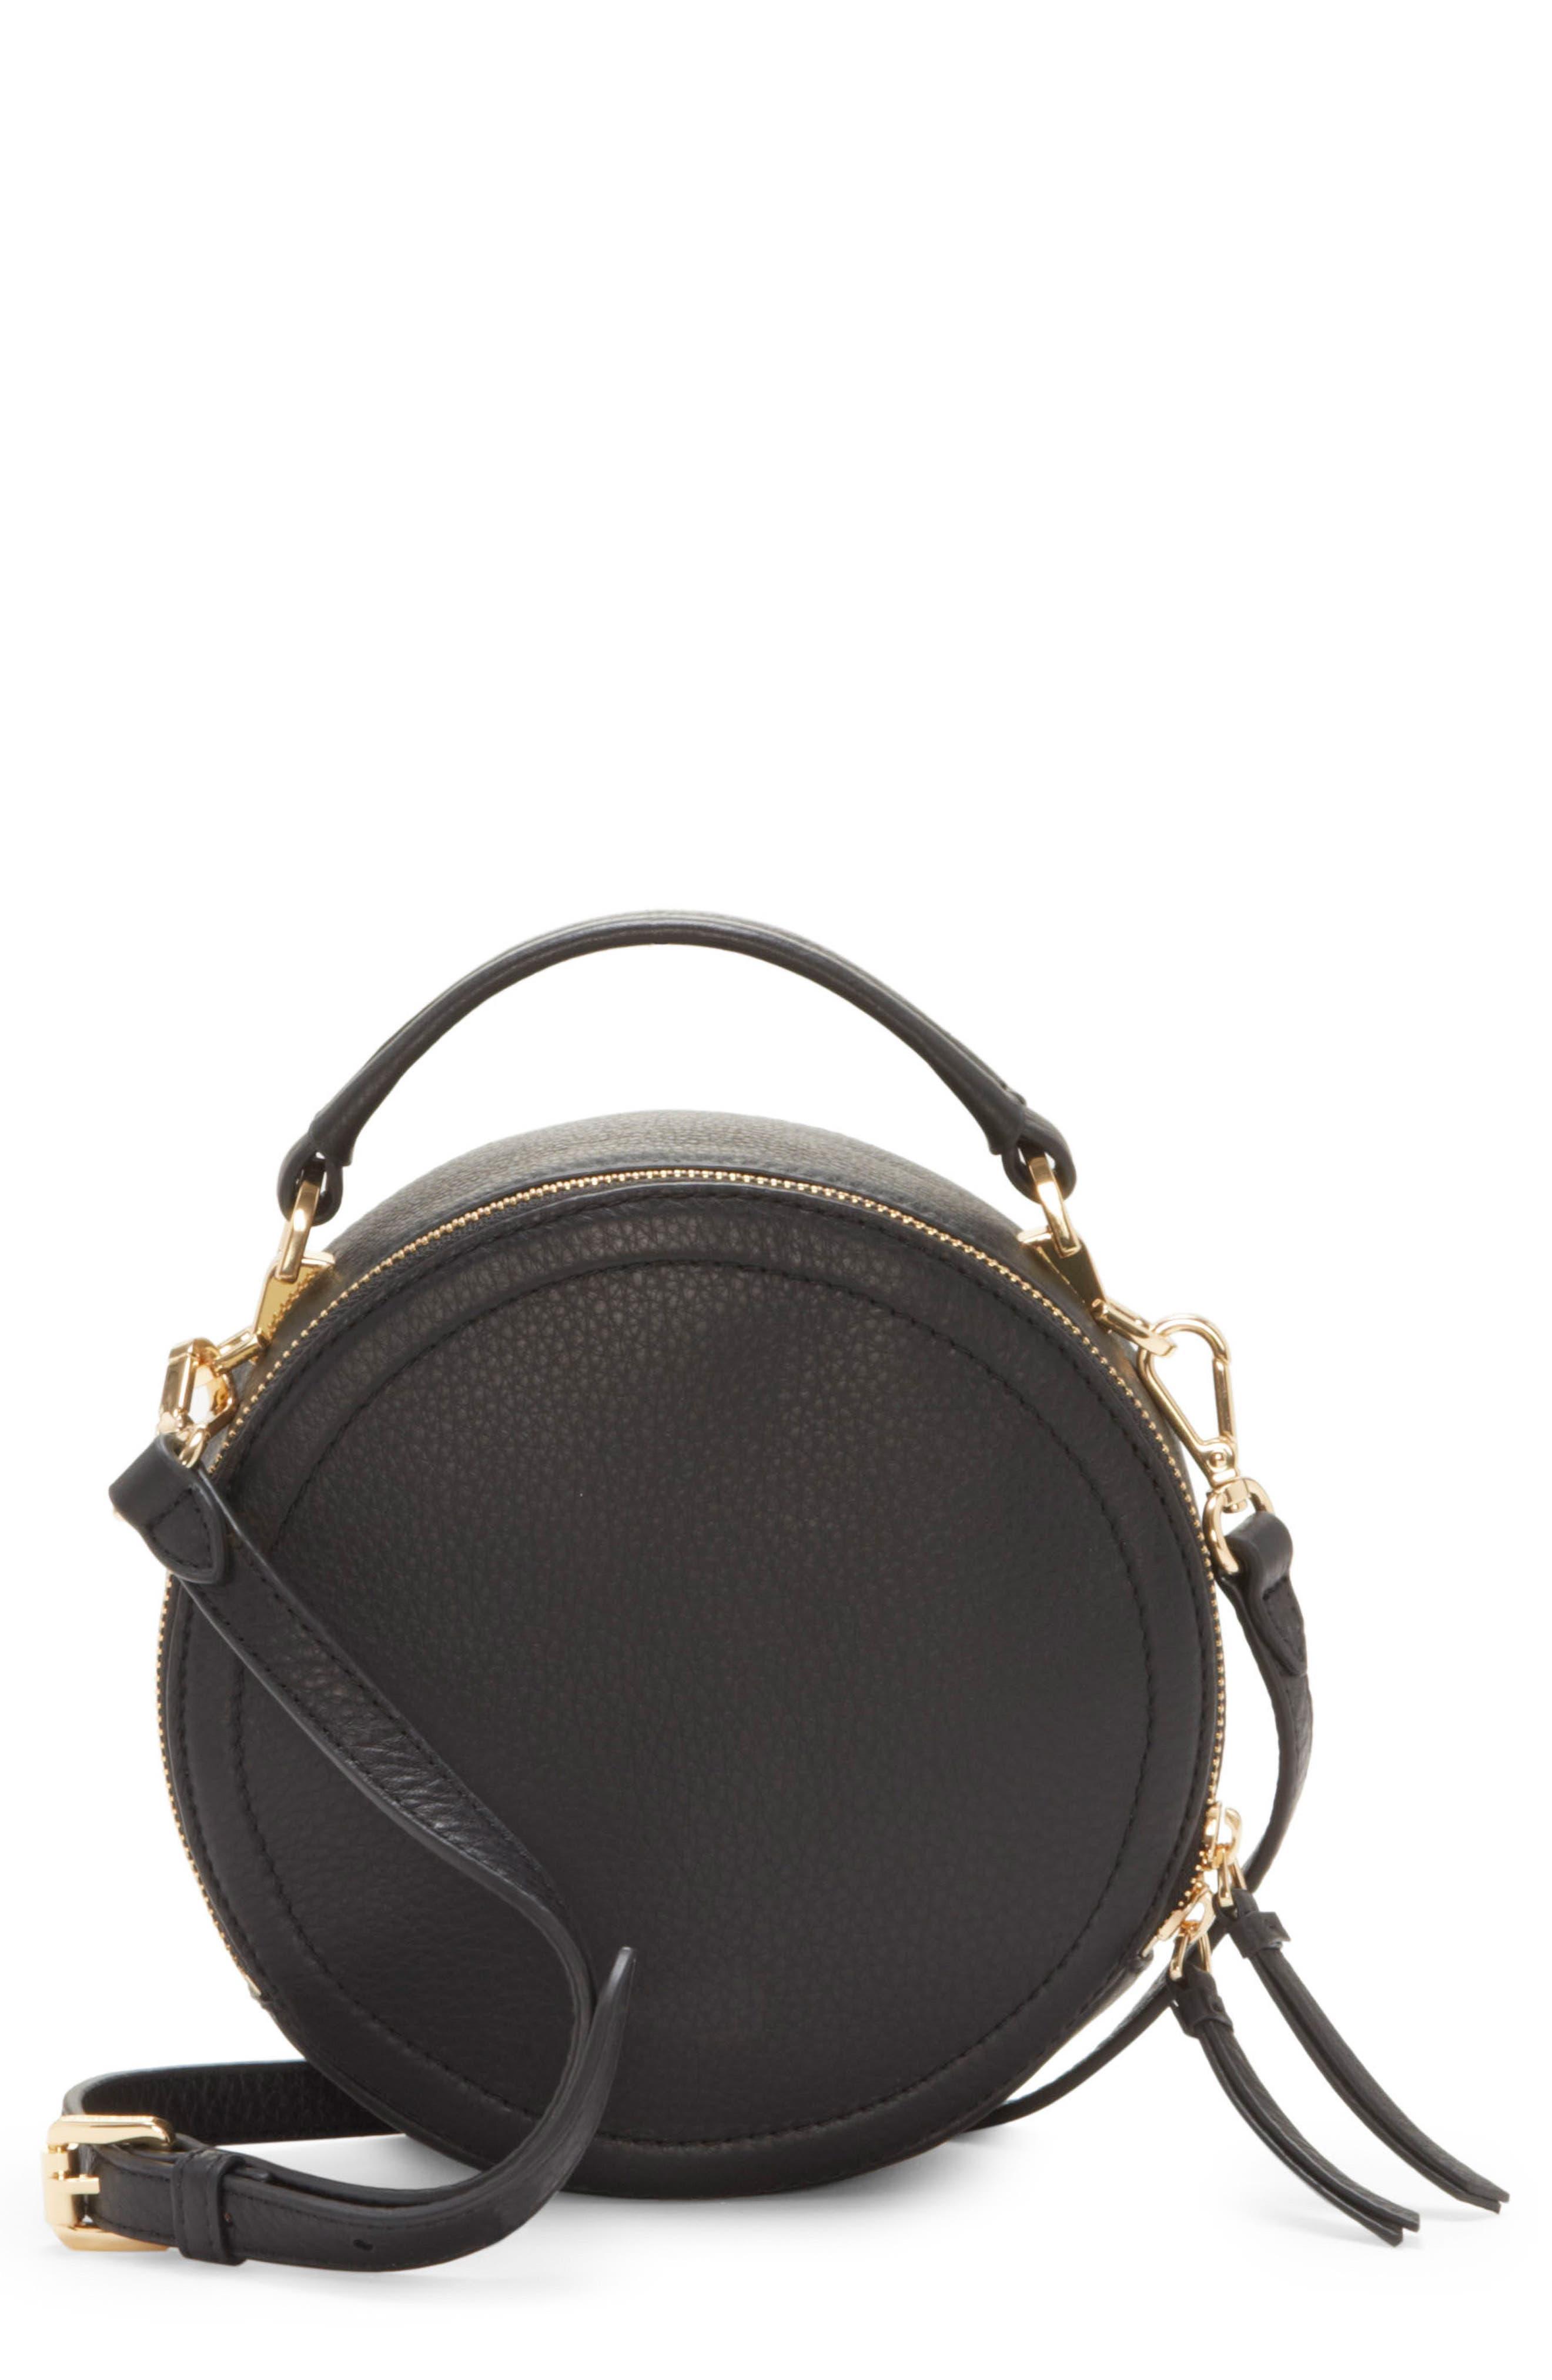 Bray Leather Crossbody Bag,                         Main,                         color, Black